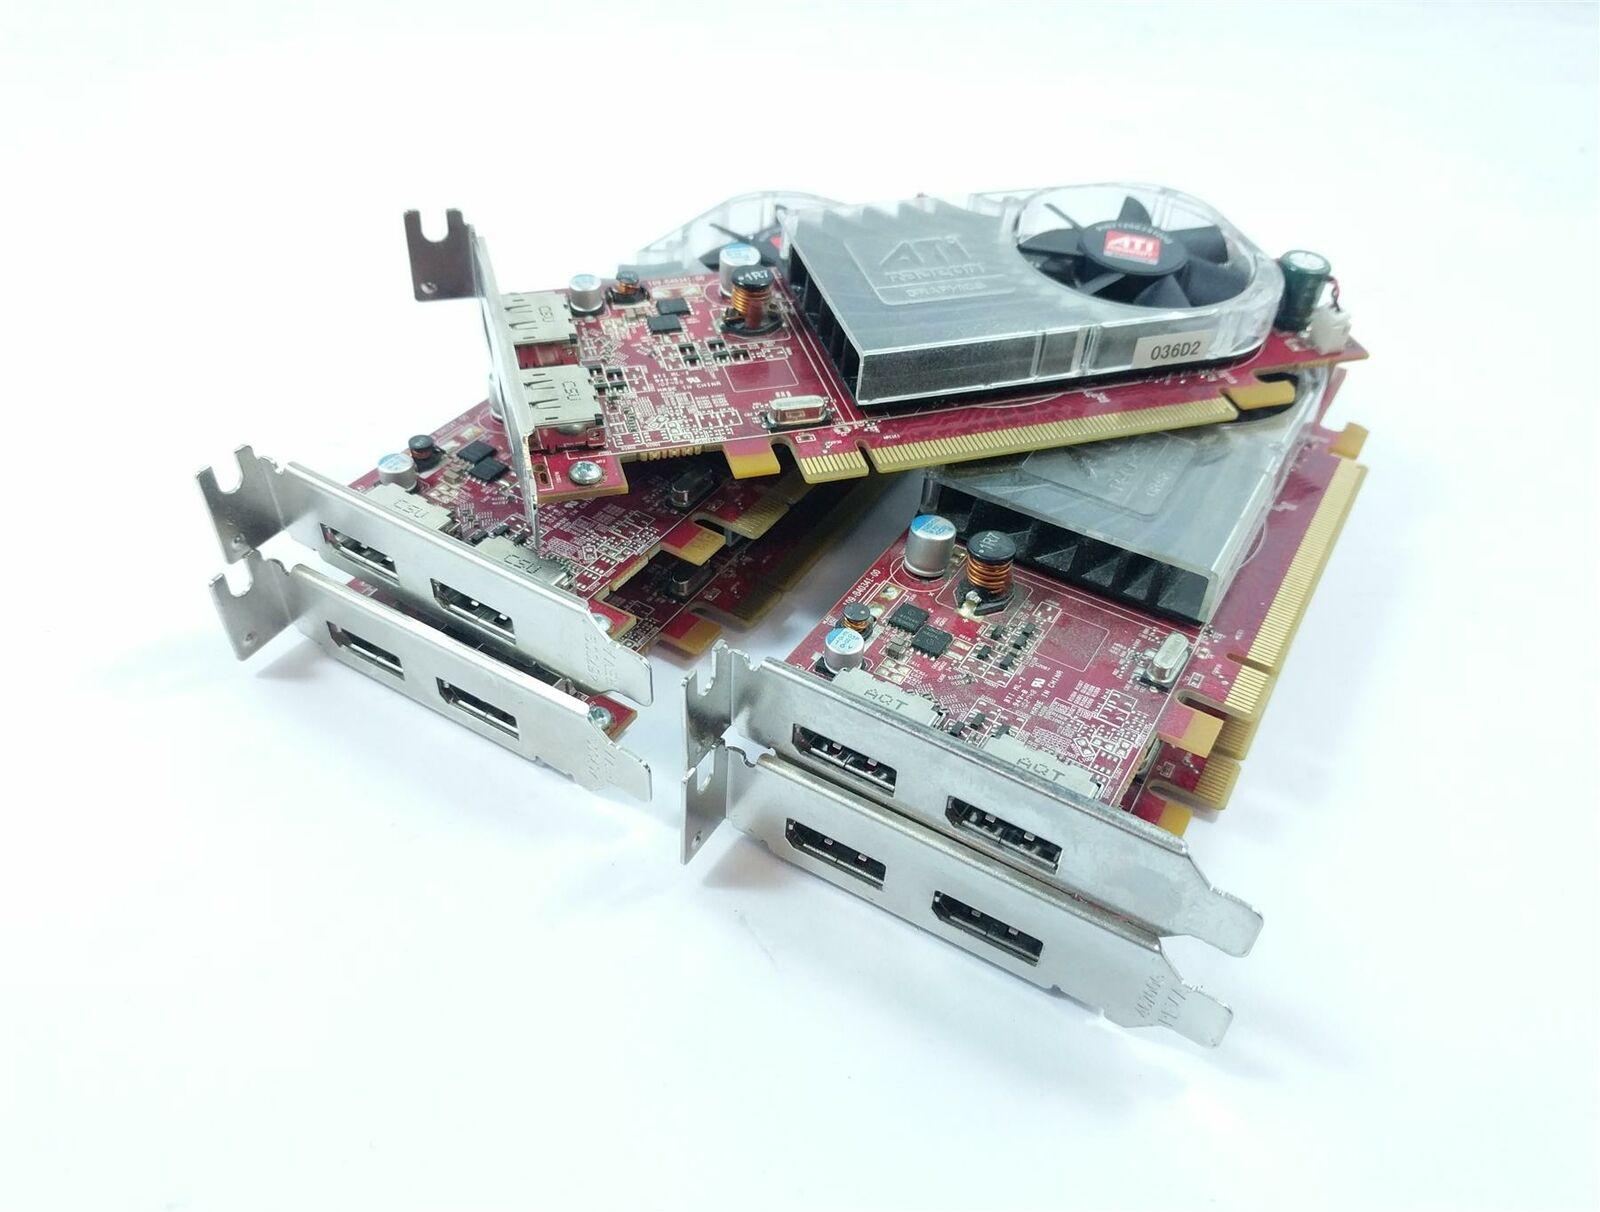 5x Dell C120D HD3470 256MB PCI-E Dual Display Port Low Profile Graphics Card